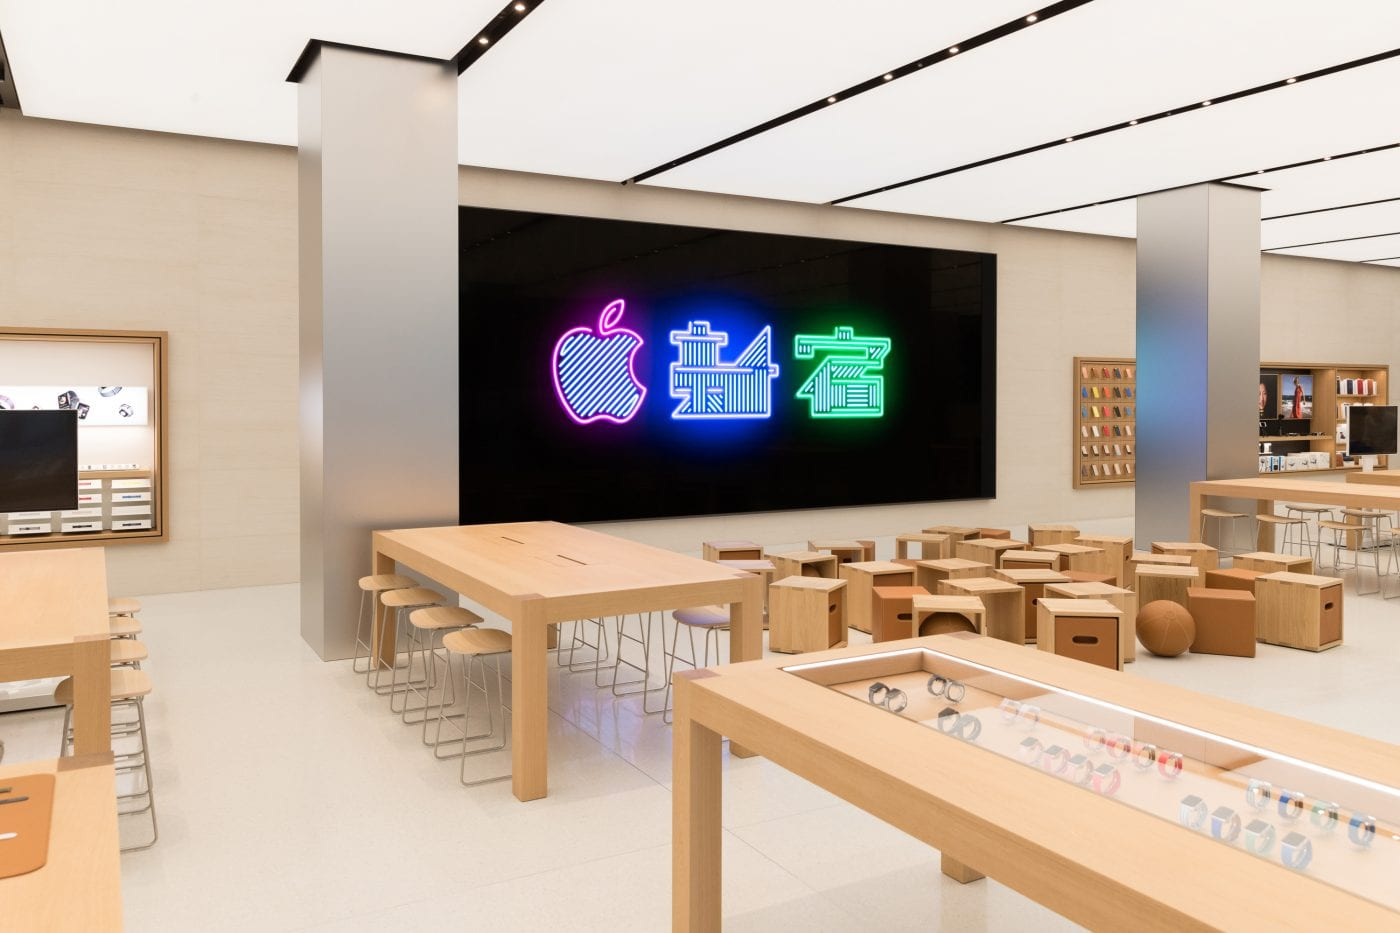 Apple Store Shinjuku Tokyo 1 - Apple sdílel fotky z nového Apple Storu v Shinjuku, Tokyu